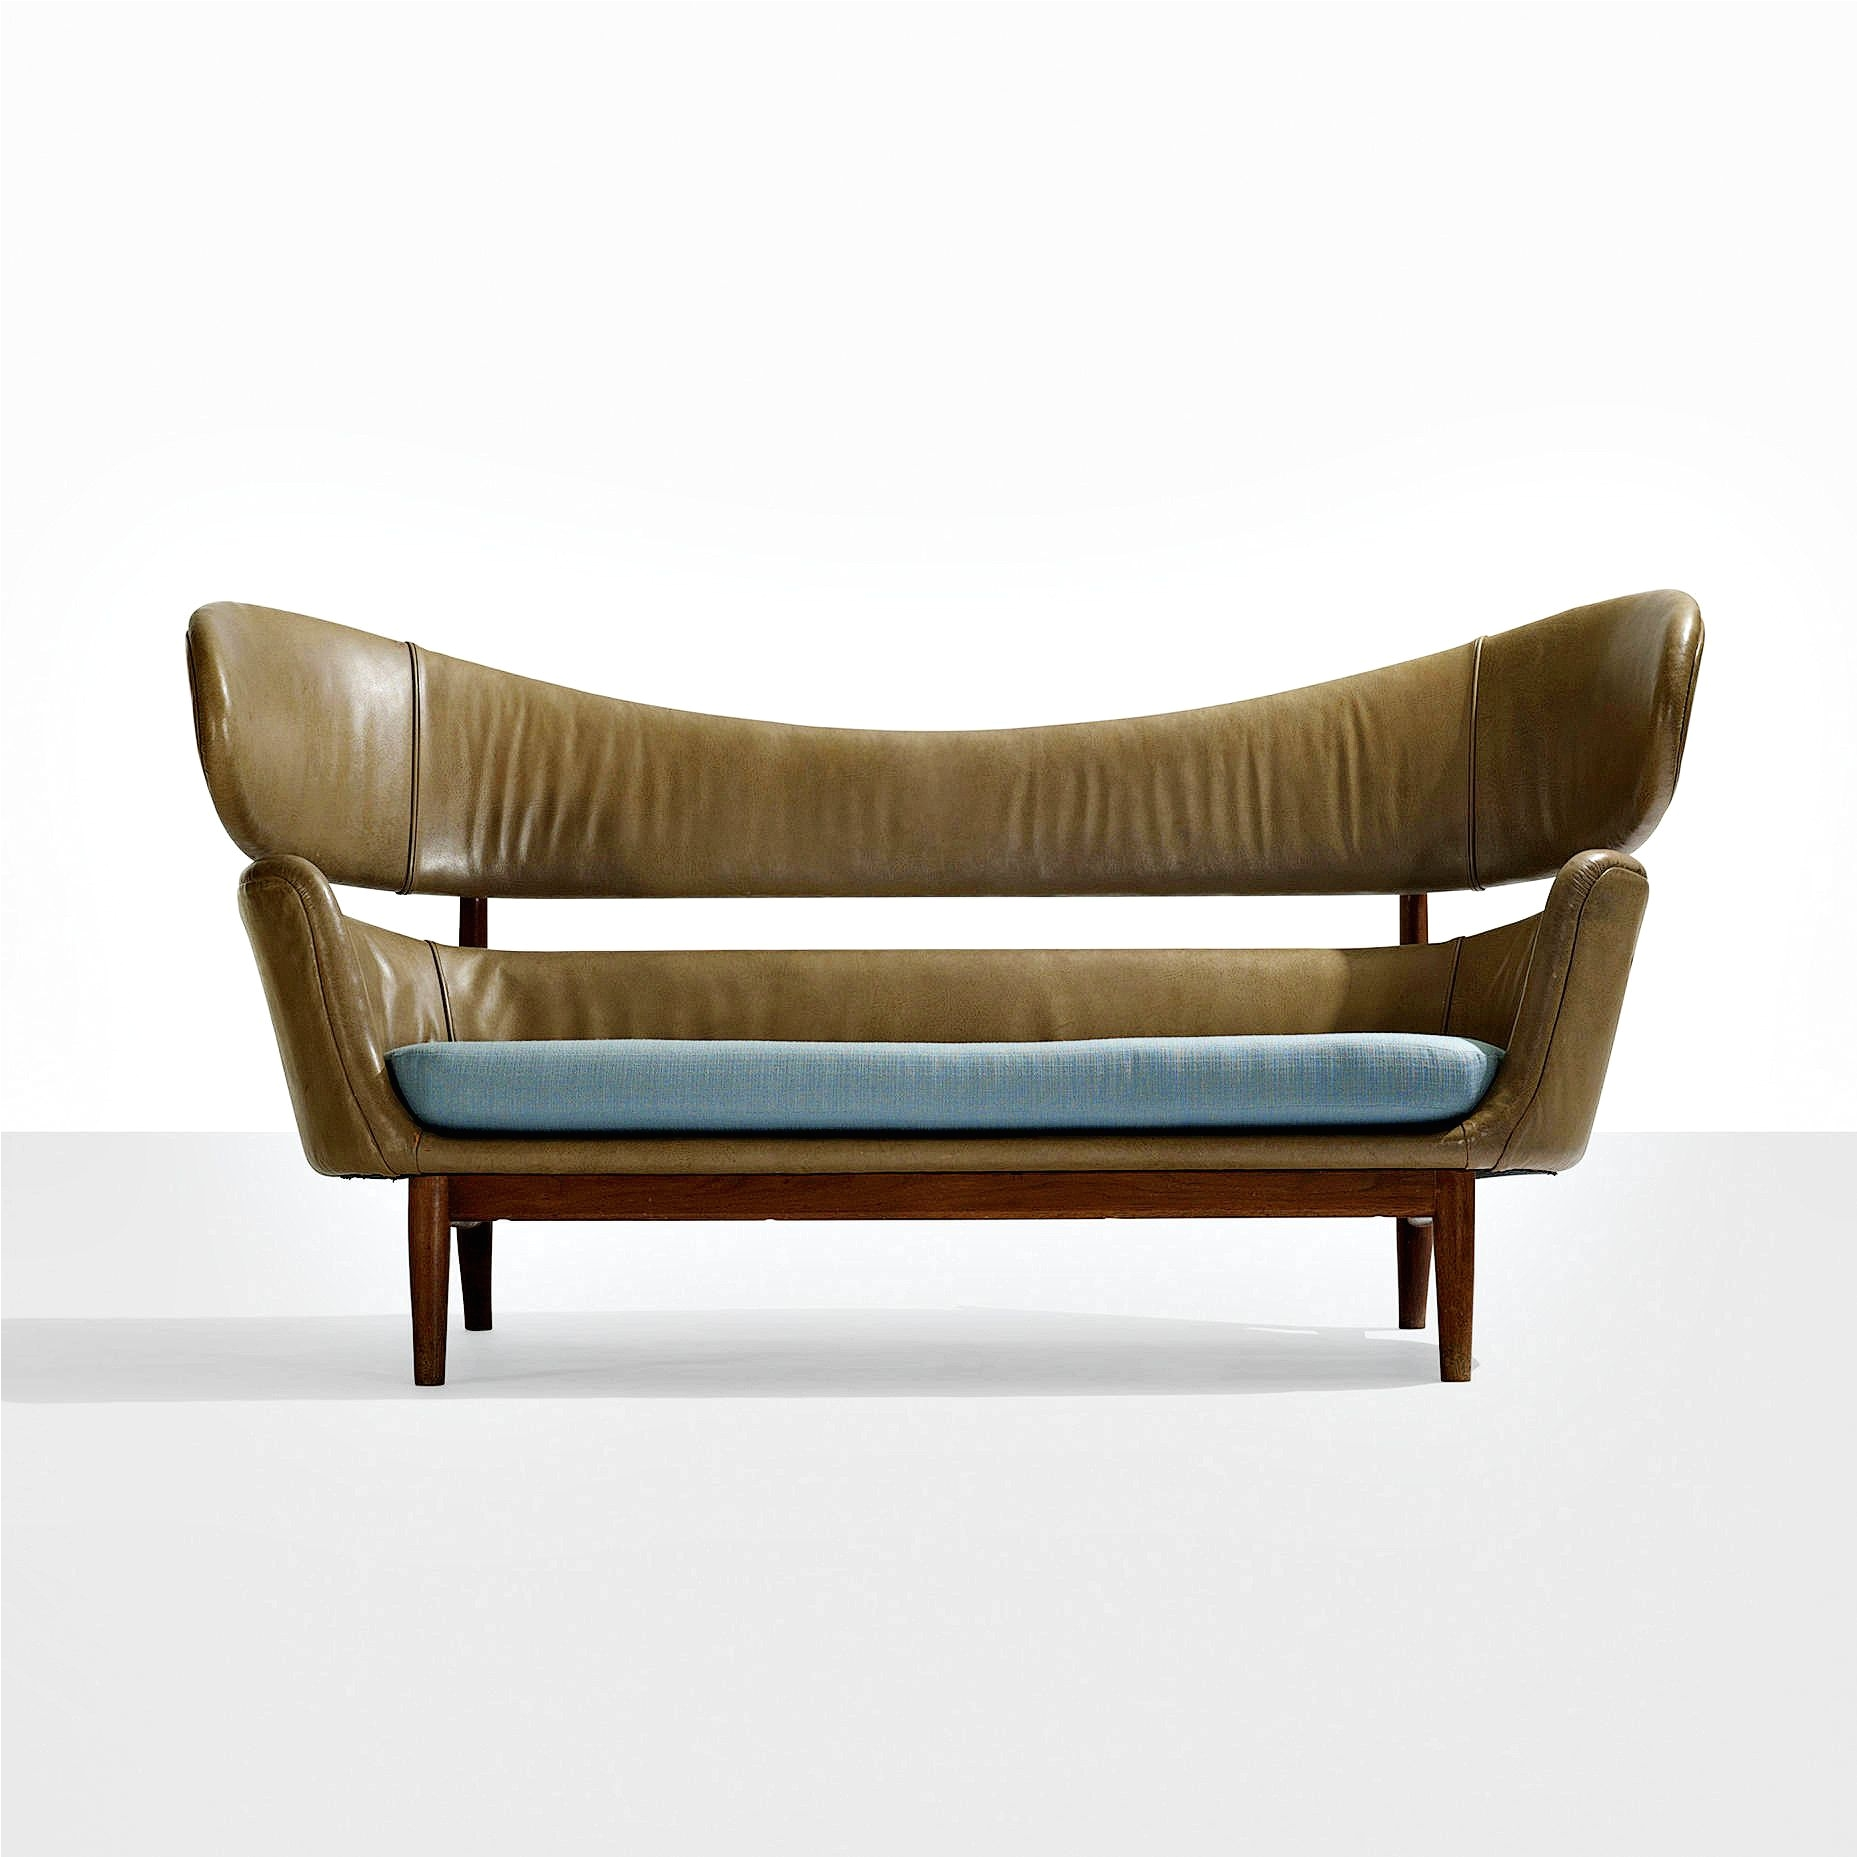 Restoration Hardware Professor Double Chair Leather sofa Scandinavian Interiors Pinterest Leather sofas